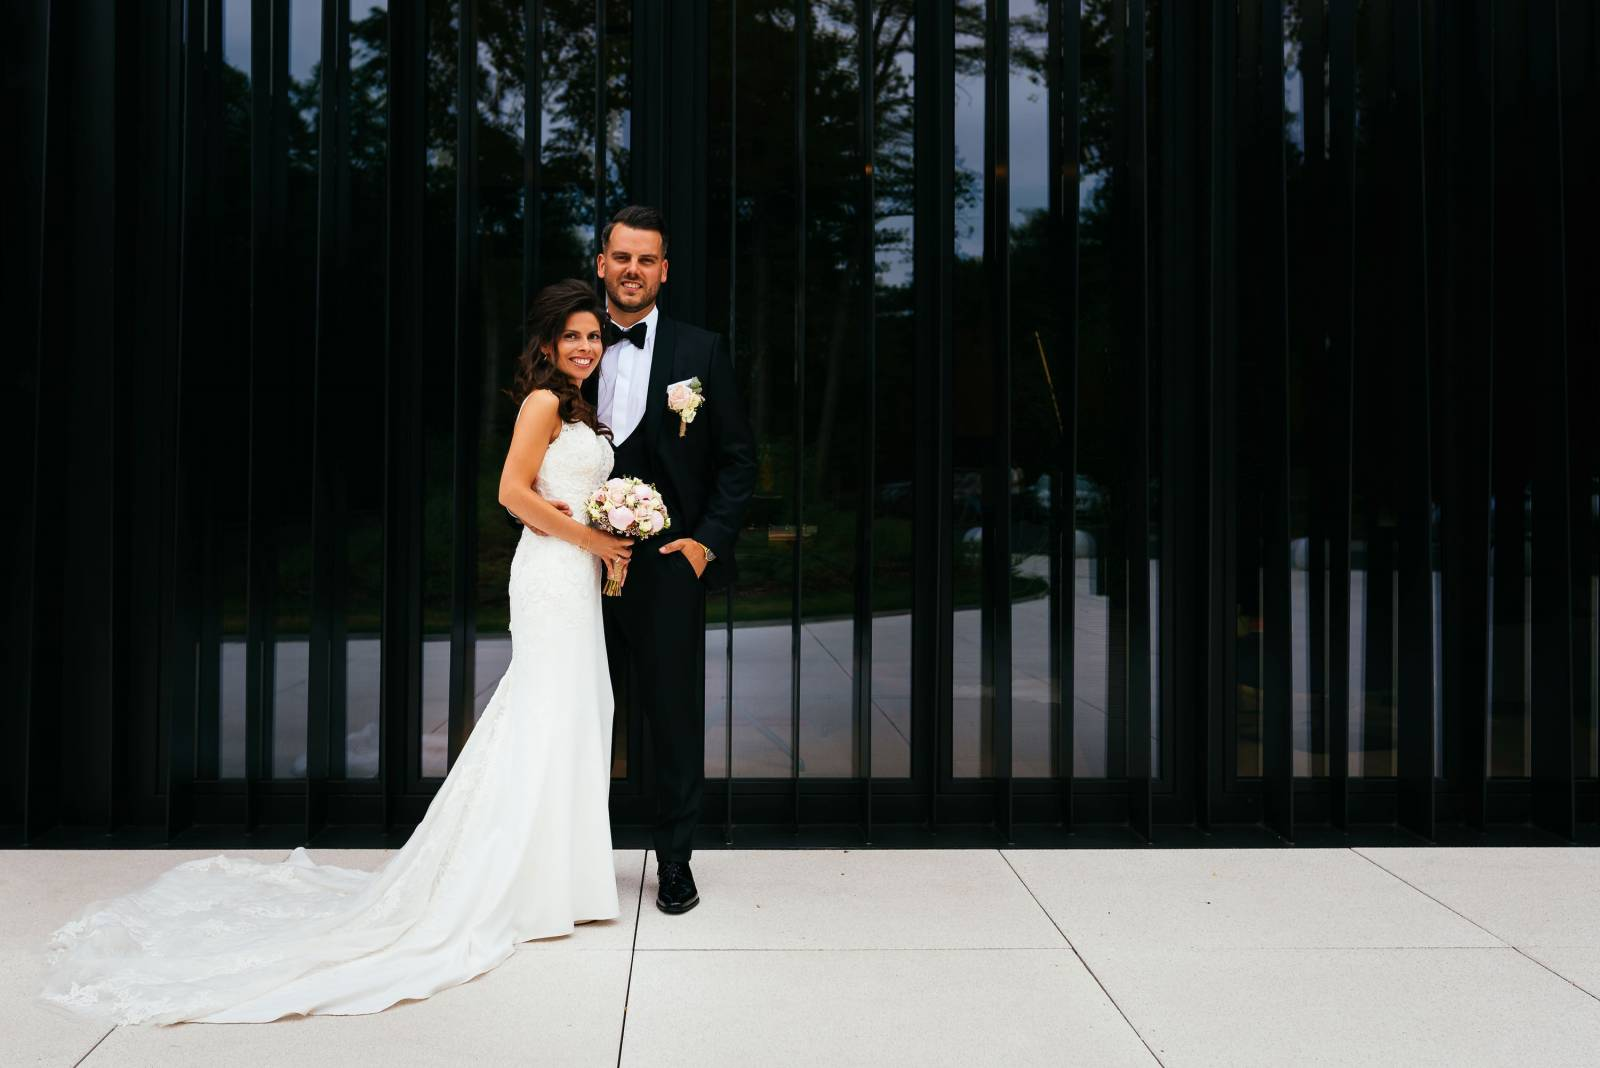 Carpe Diem Bloemen & Decoratie - House of Weddings  - 78